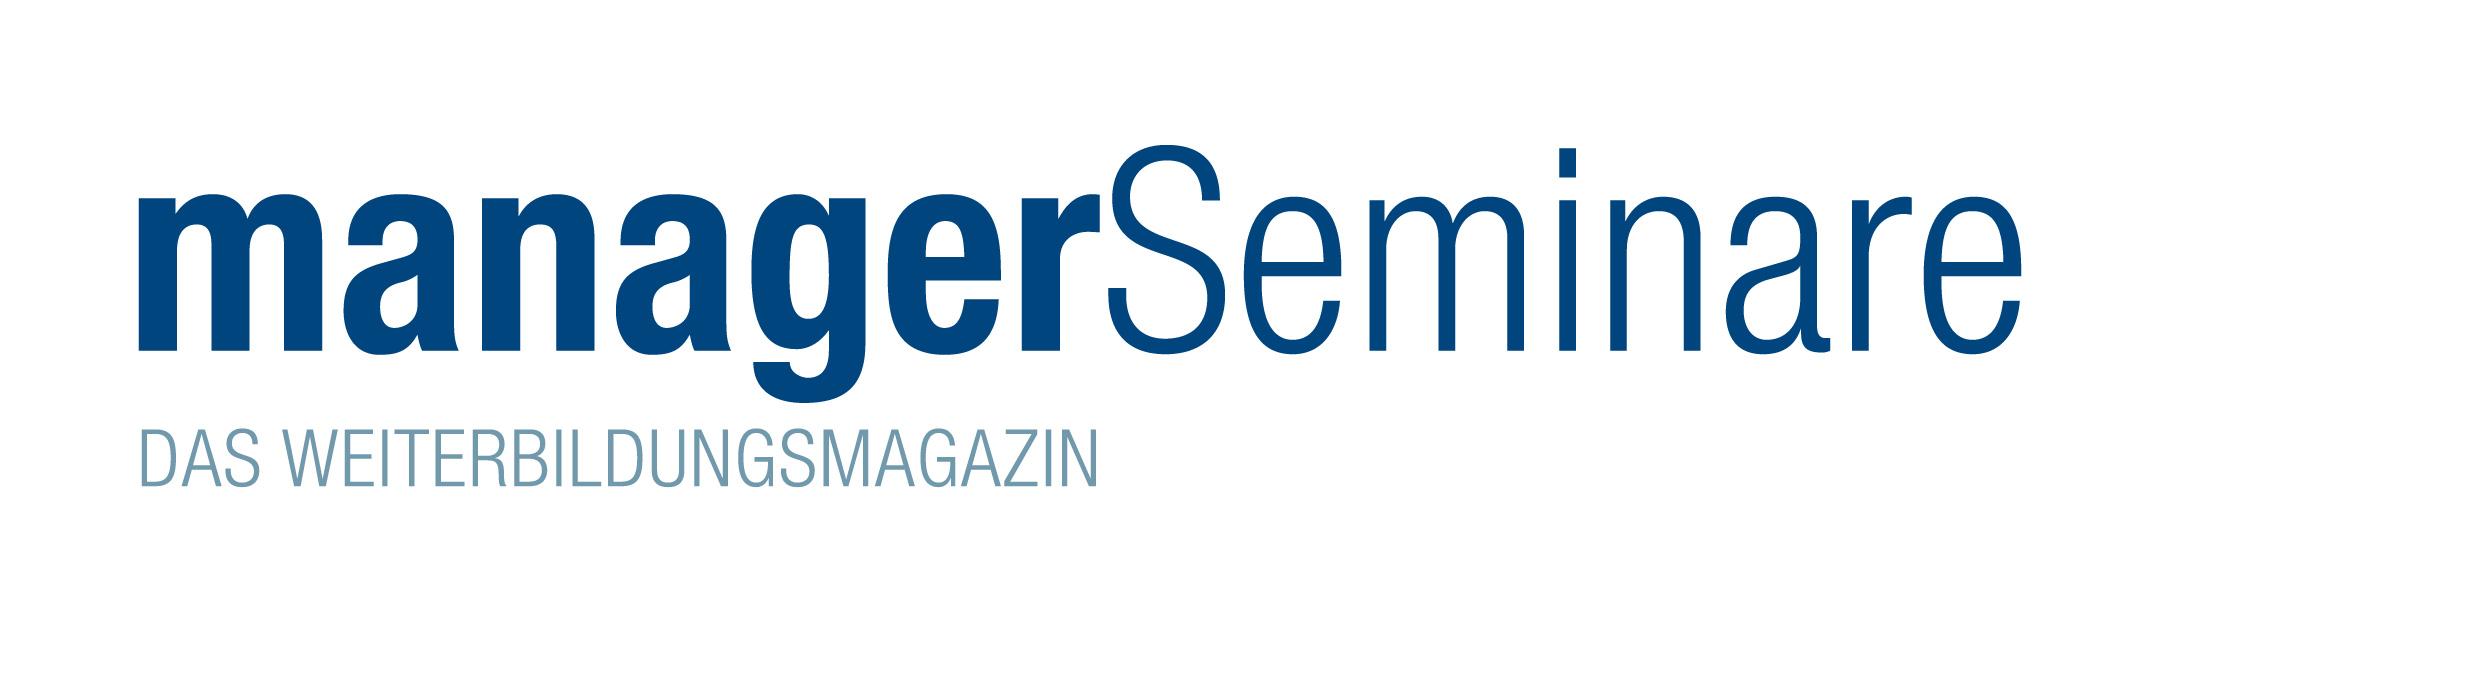 ManagerSeminare-Logo